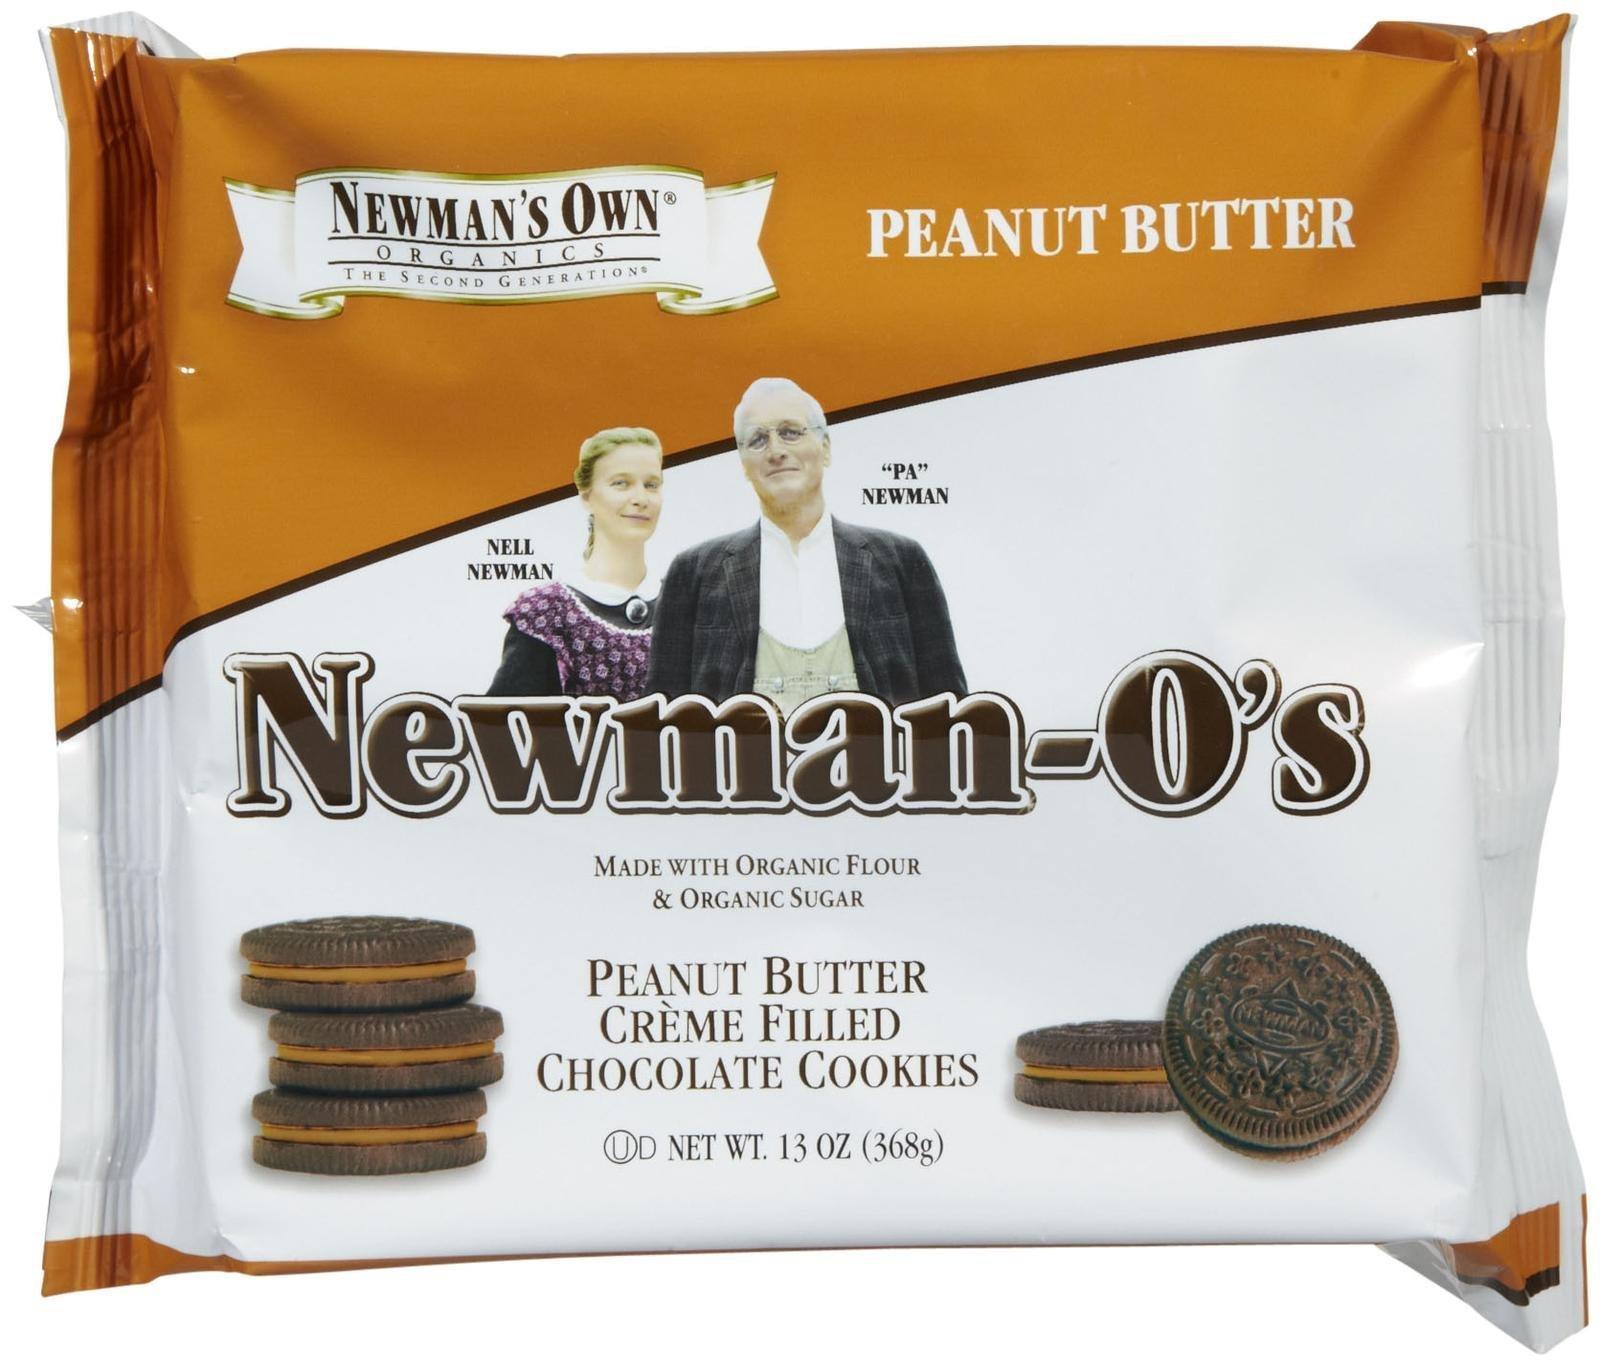 Newman's Own Organics Peanut Butter Newman O's, 13 oz